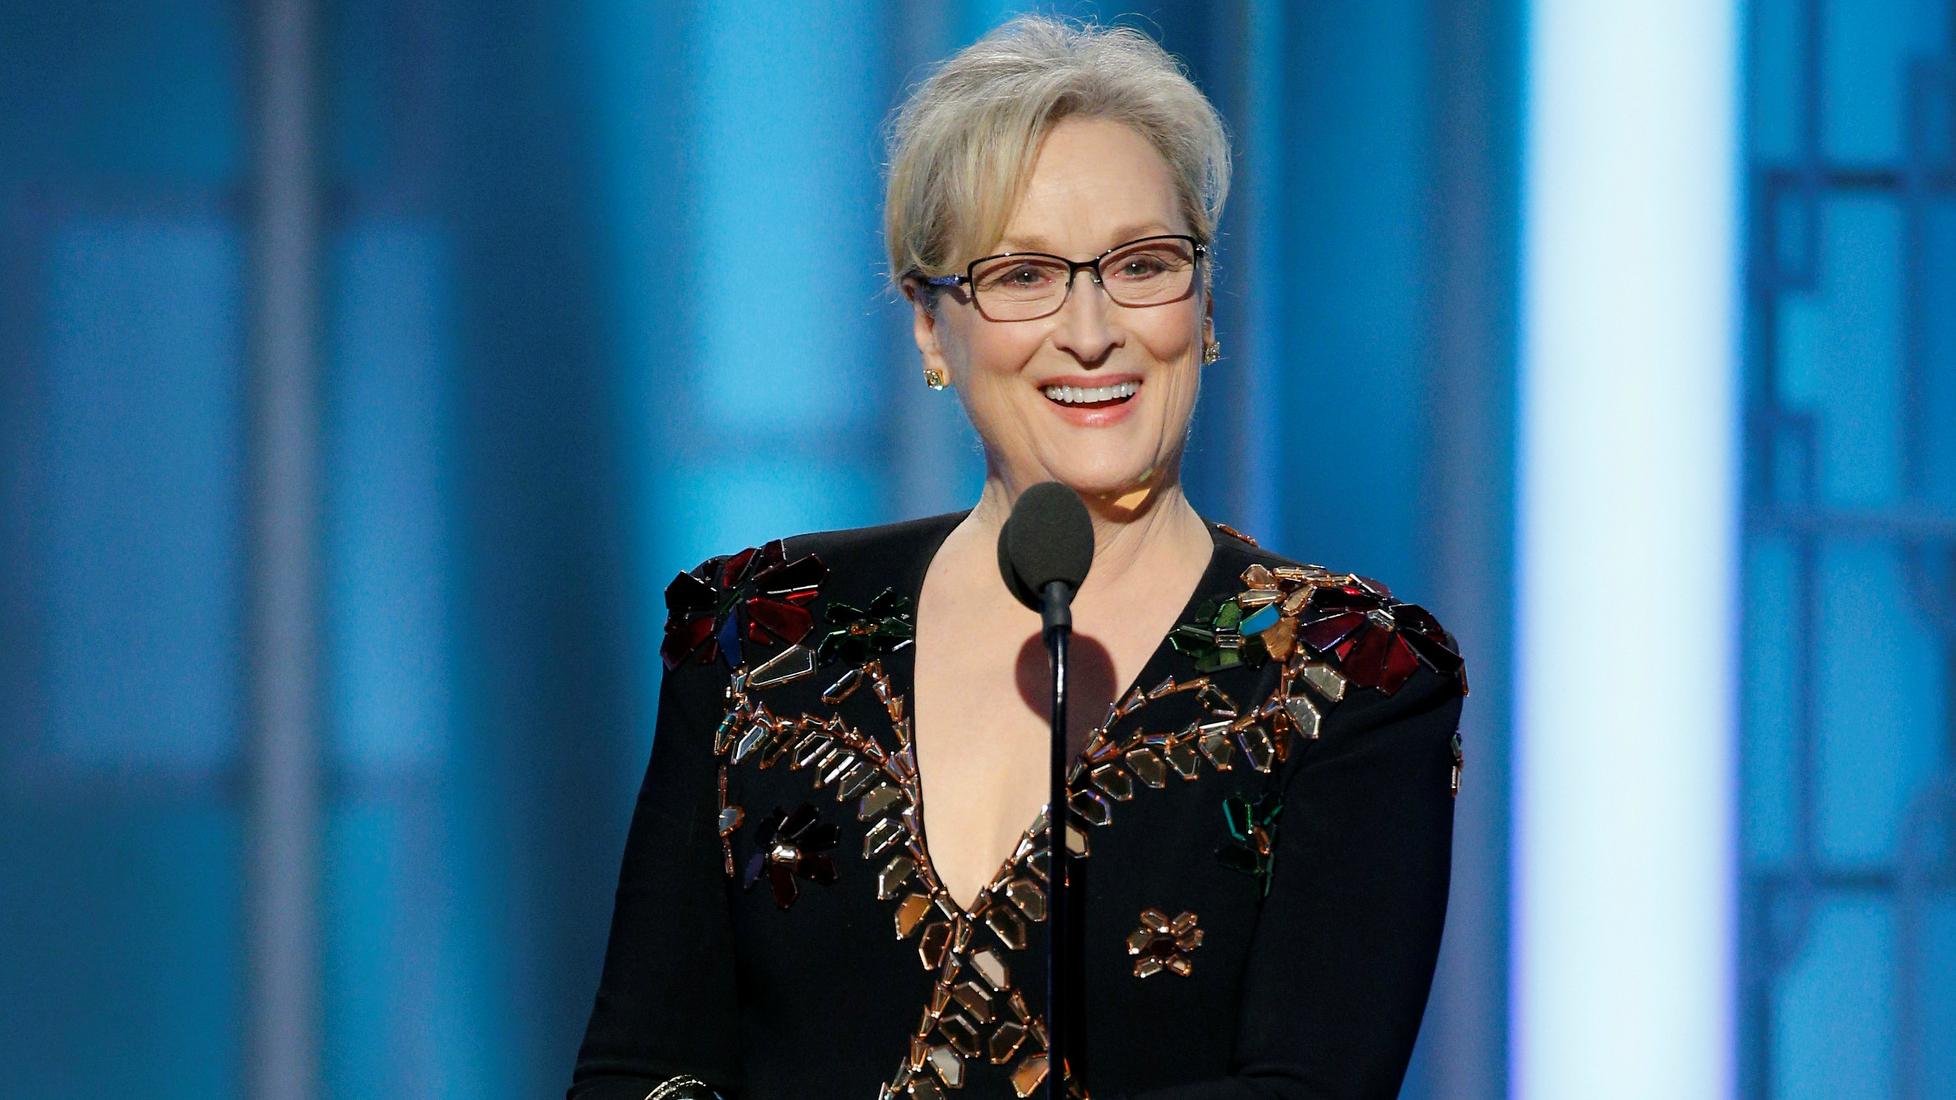 Meryl Streep at the 2017 Golden Globe Awards.